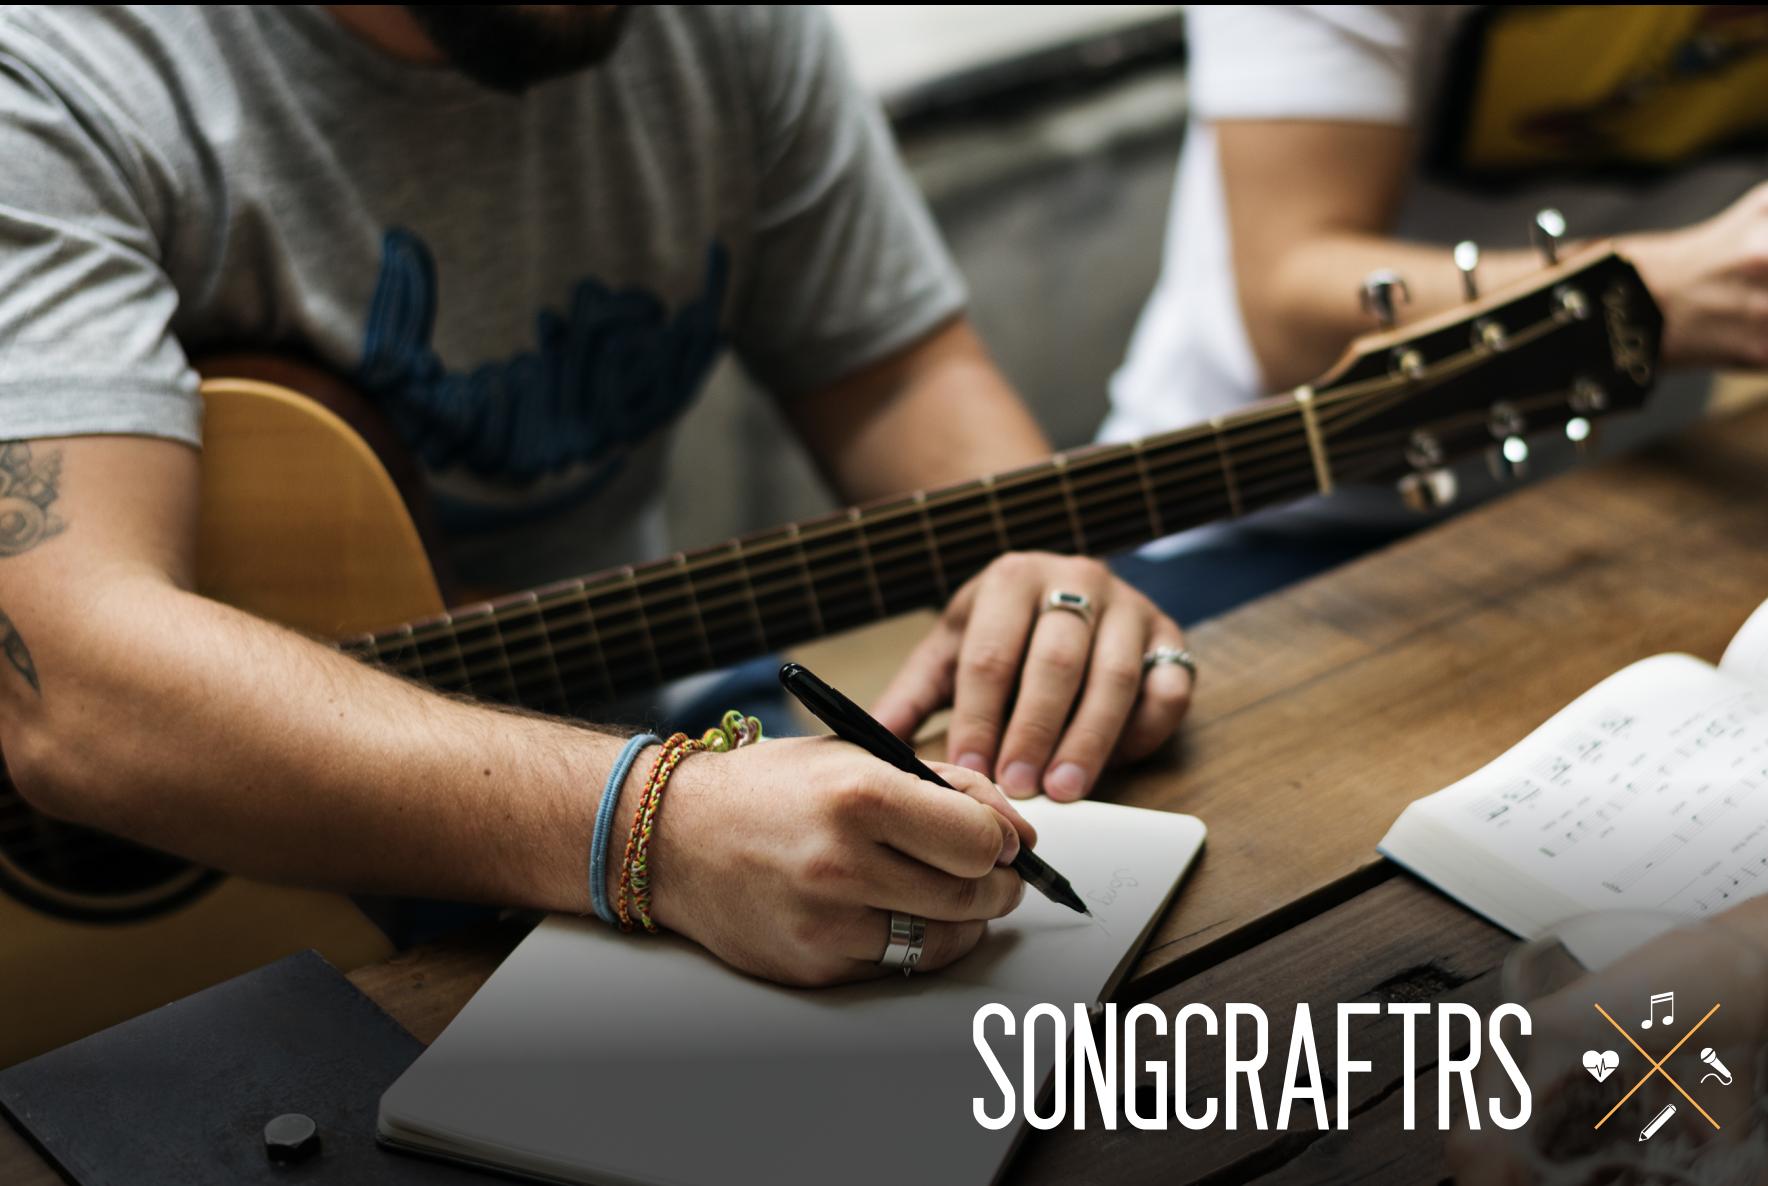 Songwriting-Academy-Berlin-Songwriting-Workshop-Singer-Songwriter-Recording-Songwriting-Unterricht